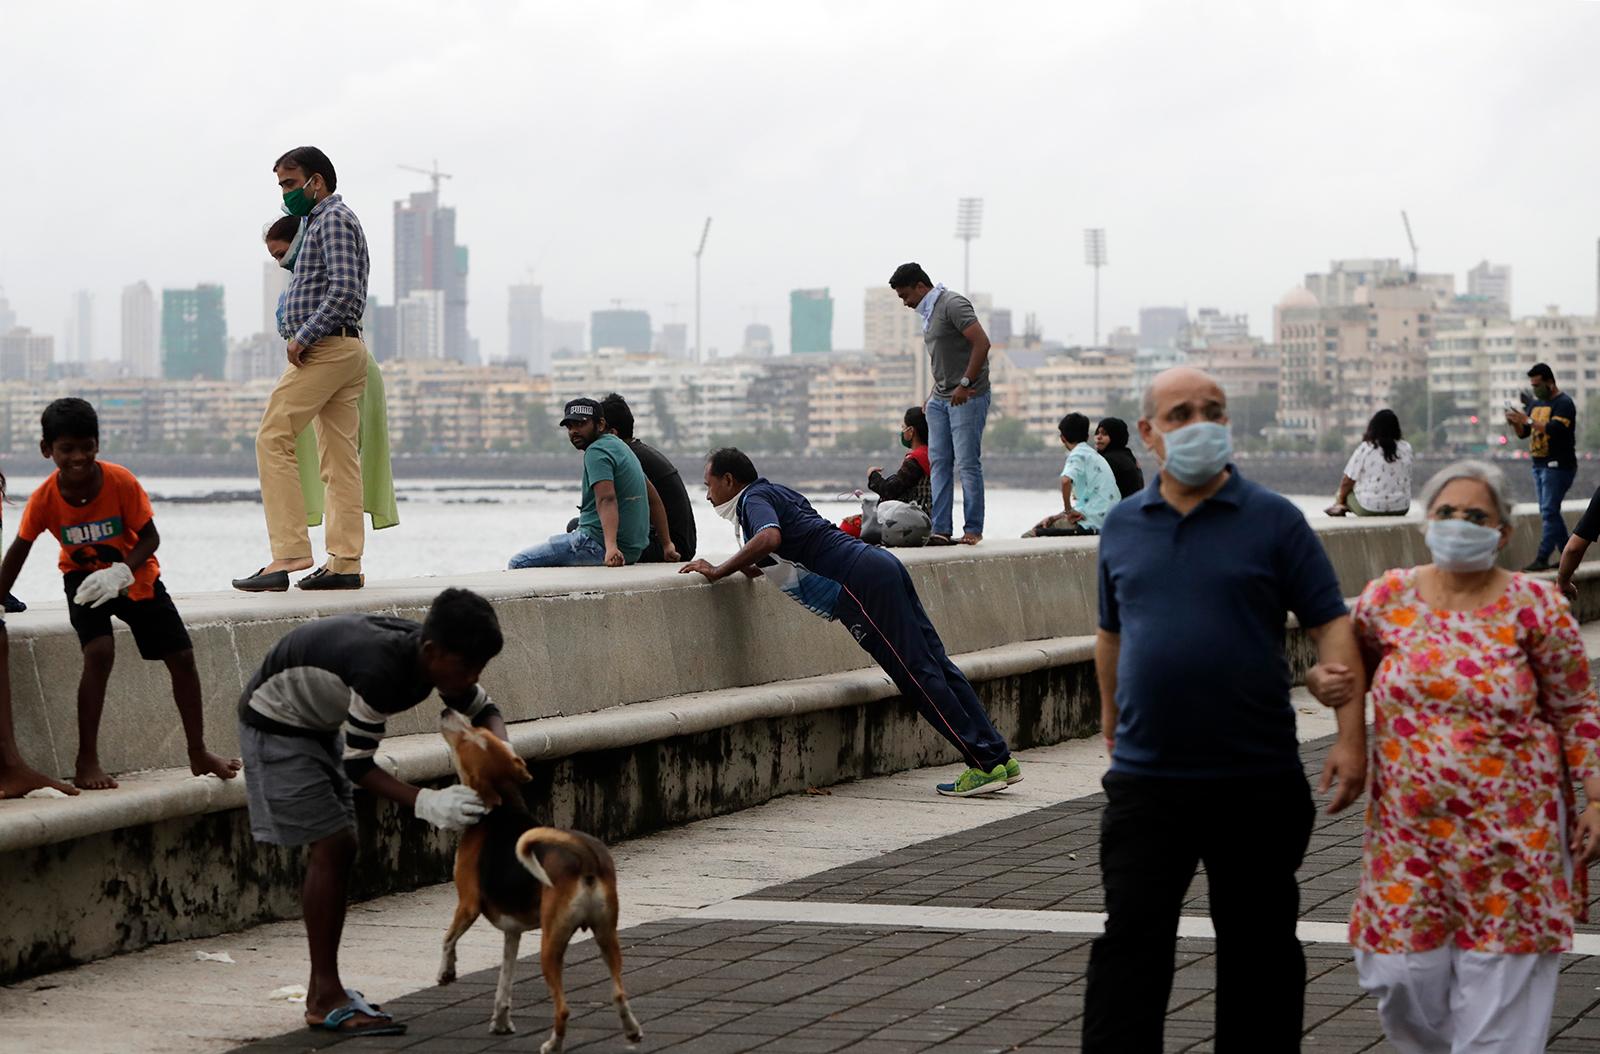 People spend time outside on the Arabian Sea coast in Mumbai, on Thursday, September 17.